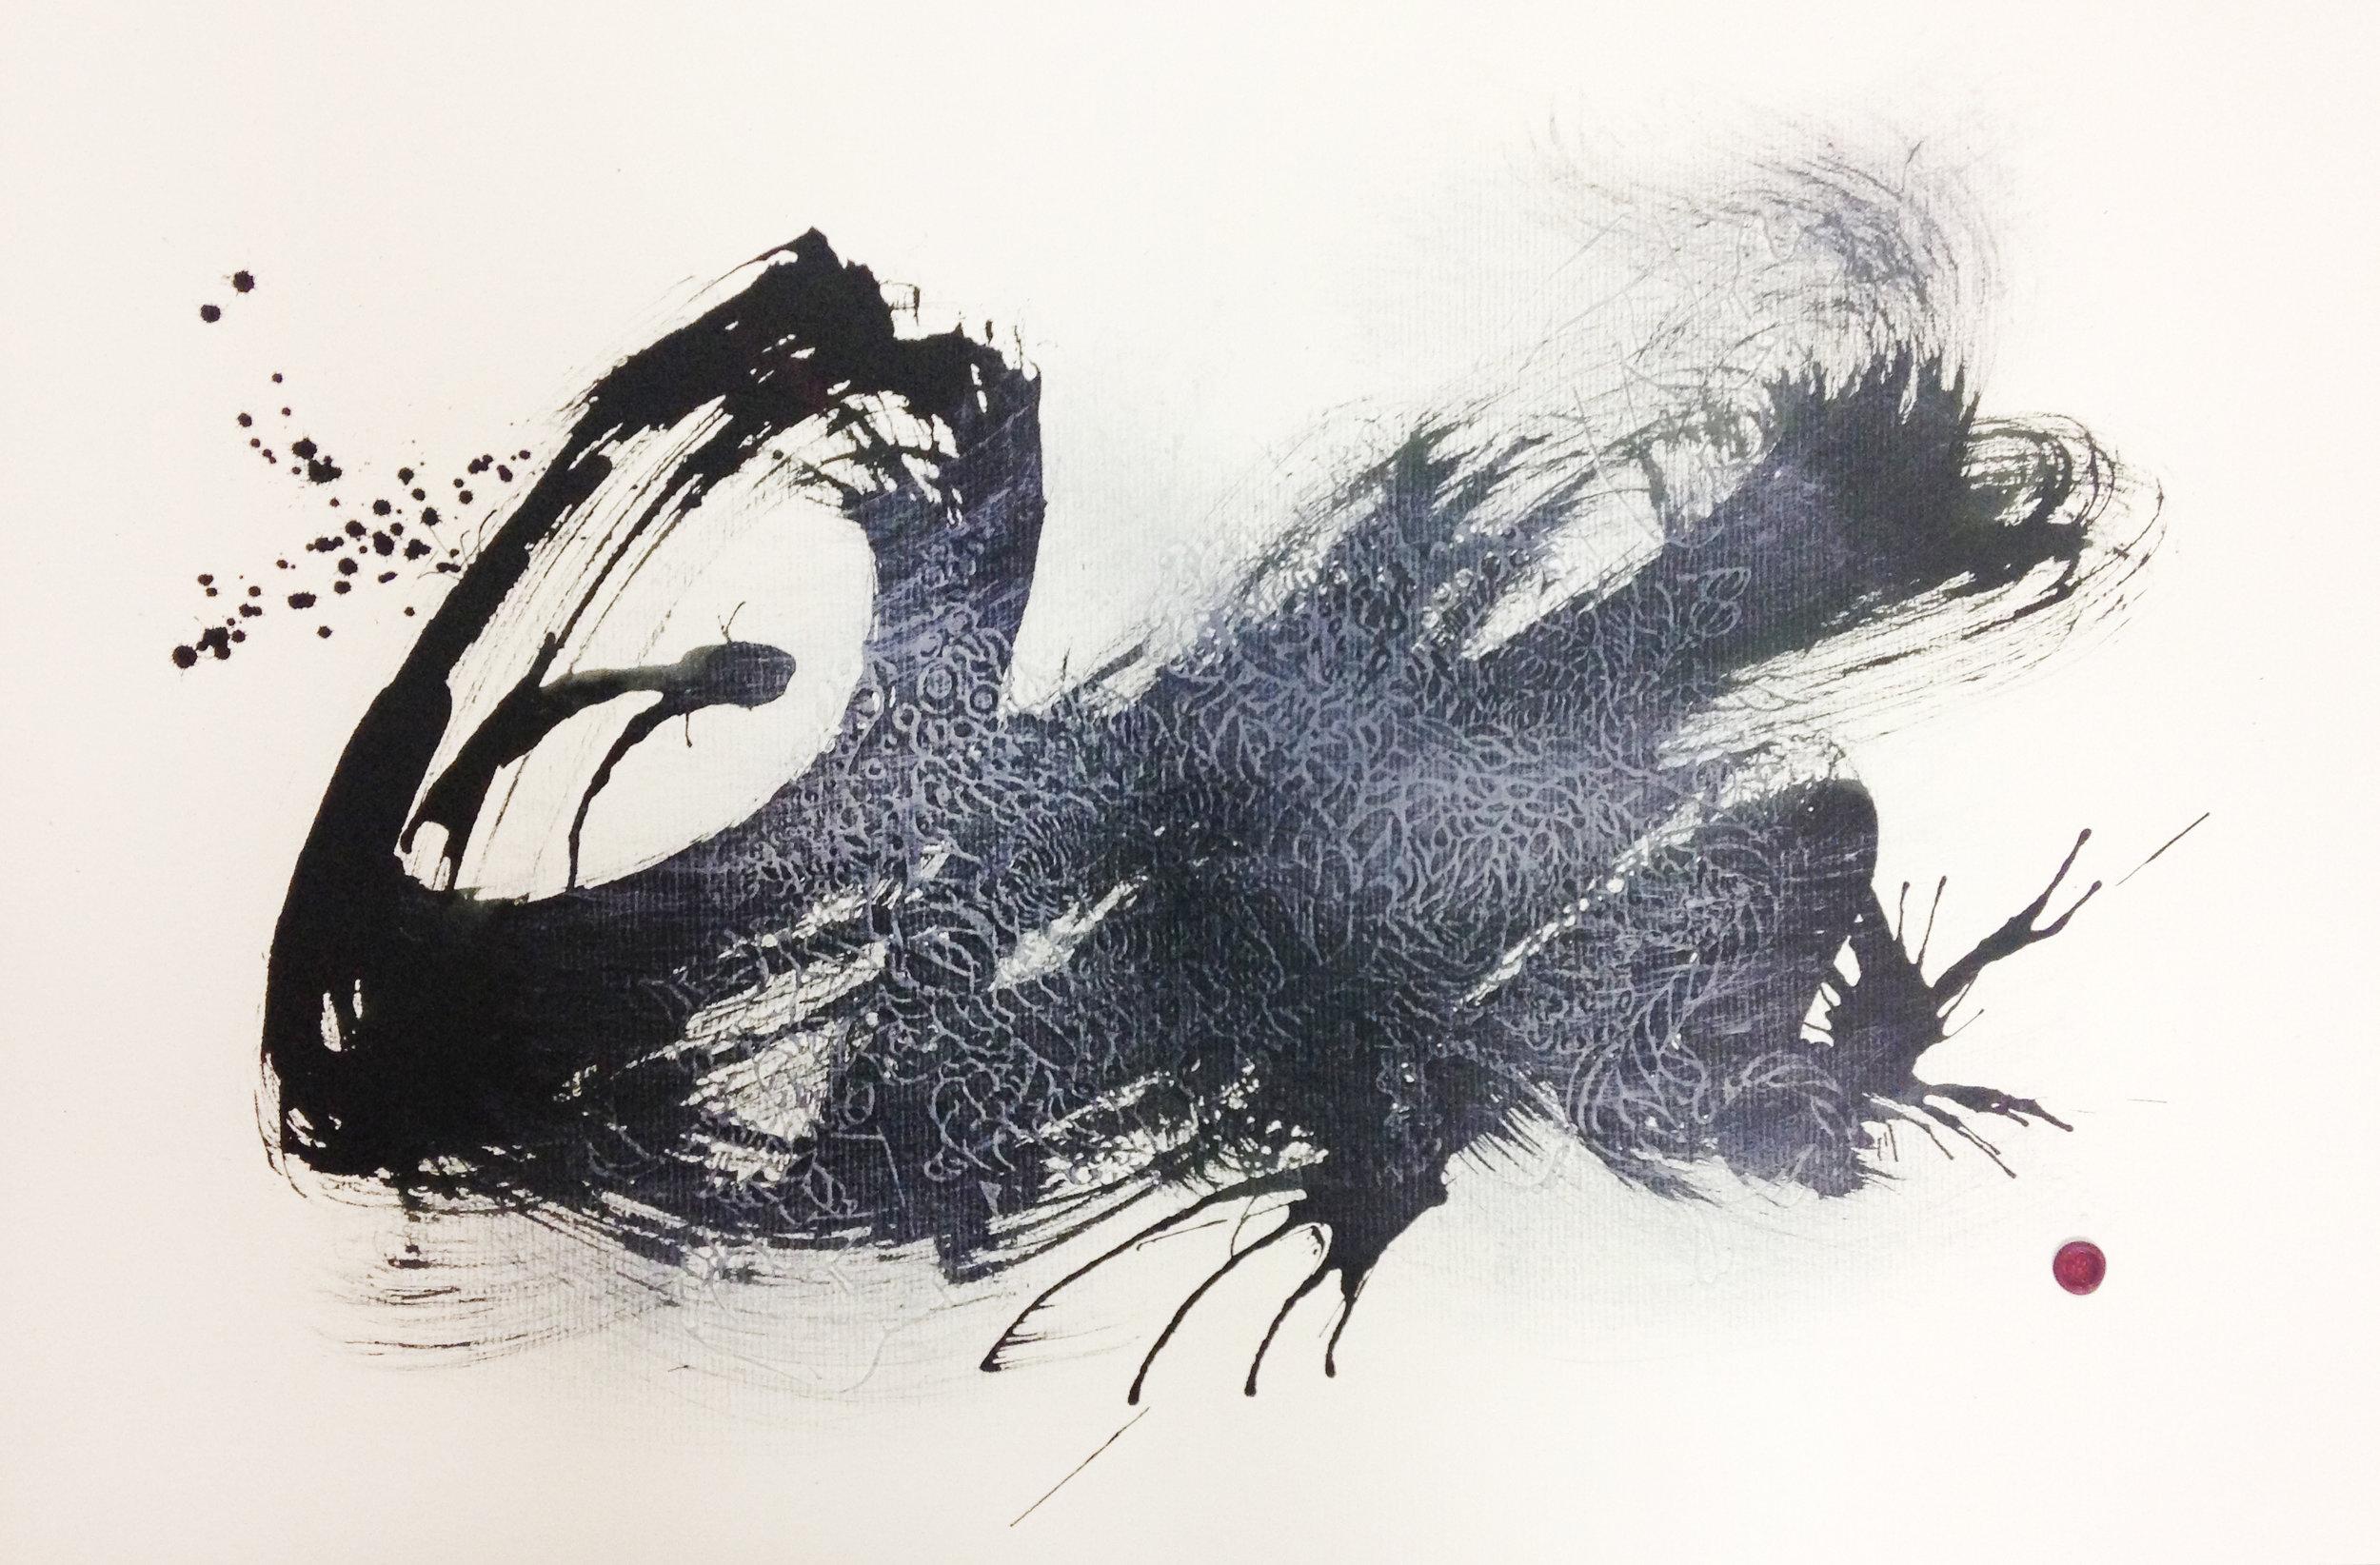 'Bedlam #1' , Paper embossing, inks, gouache, wax signature, 2014, 488 x 305mm